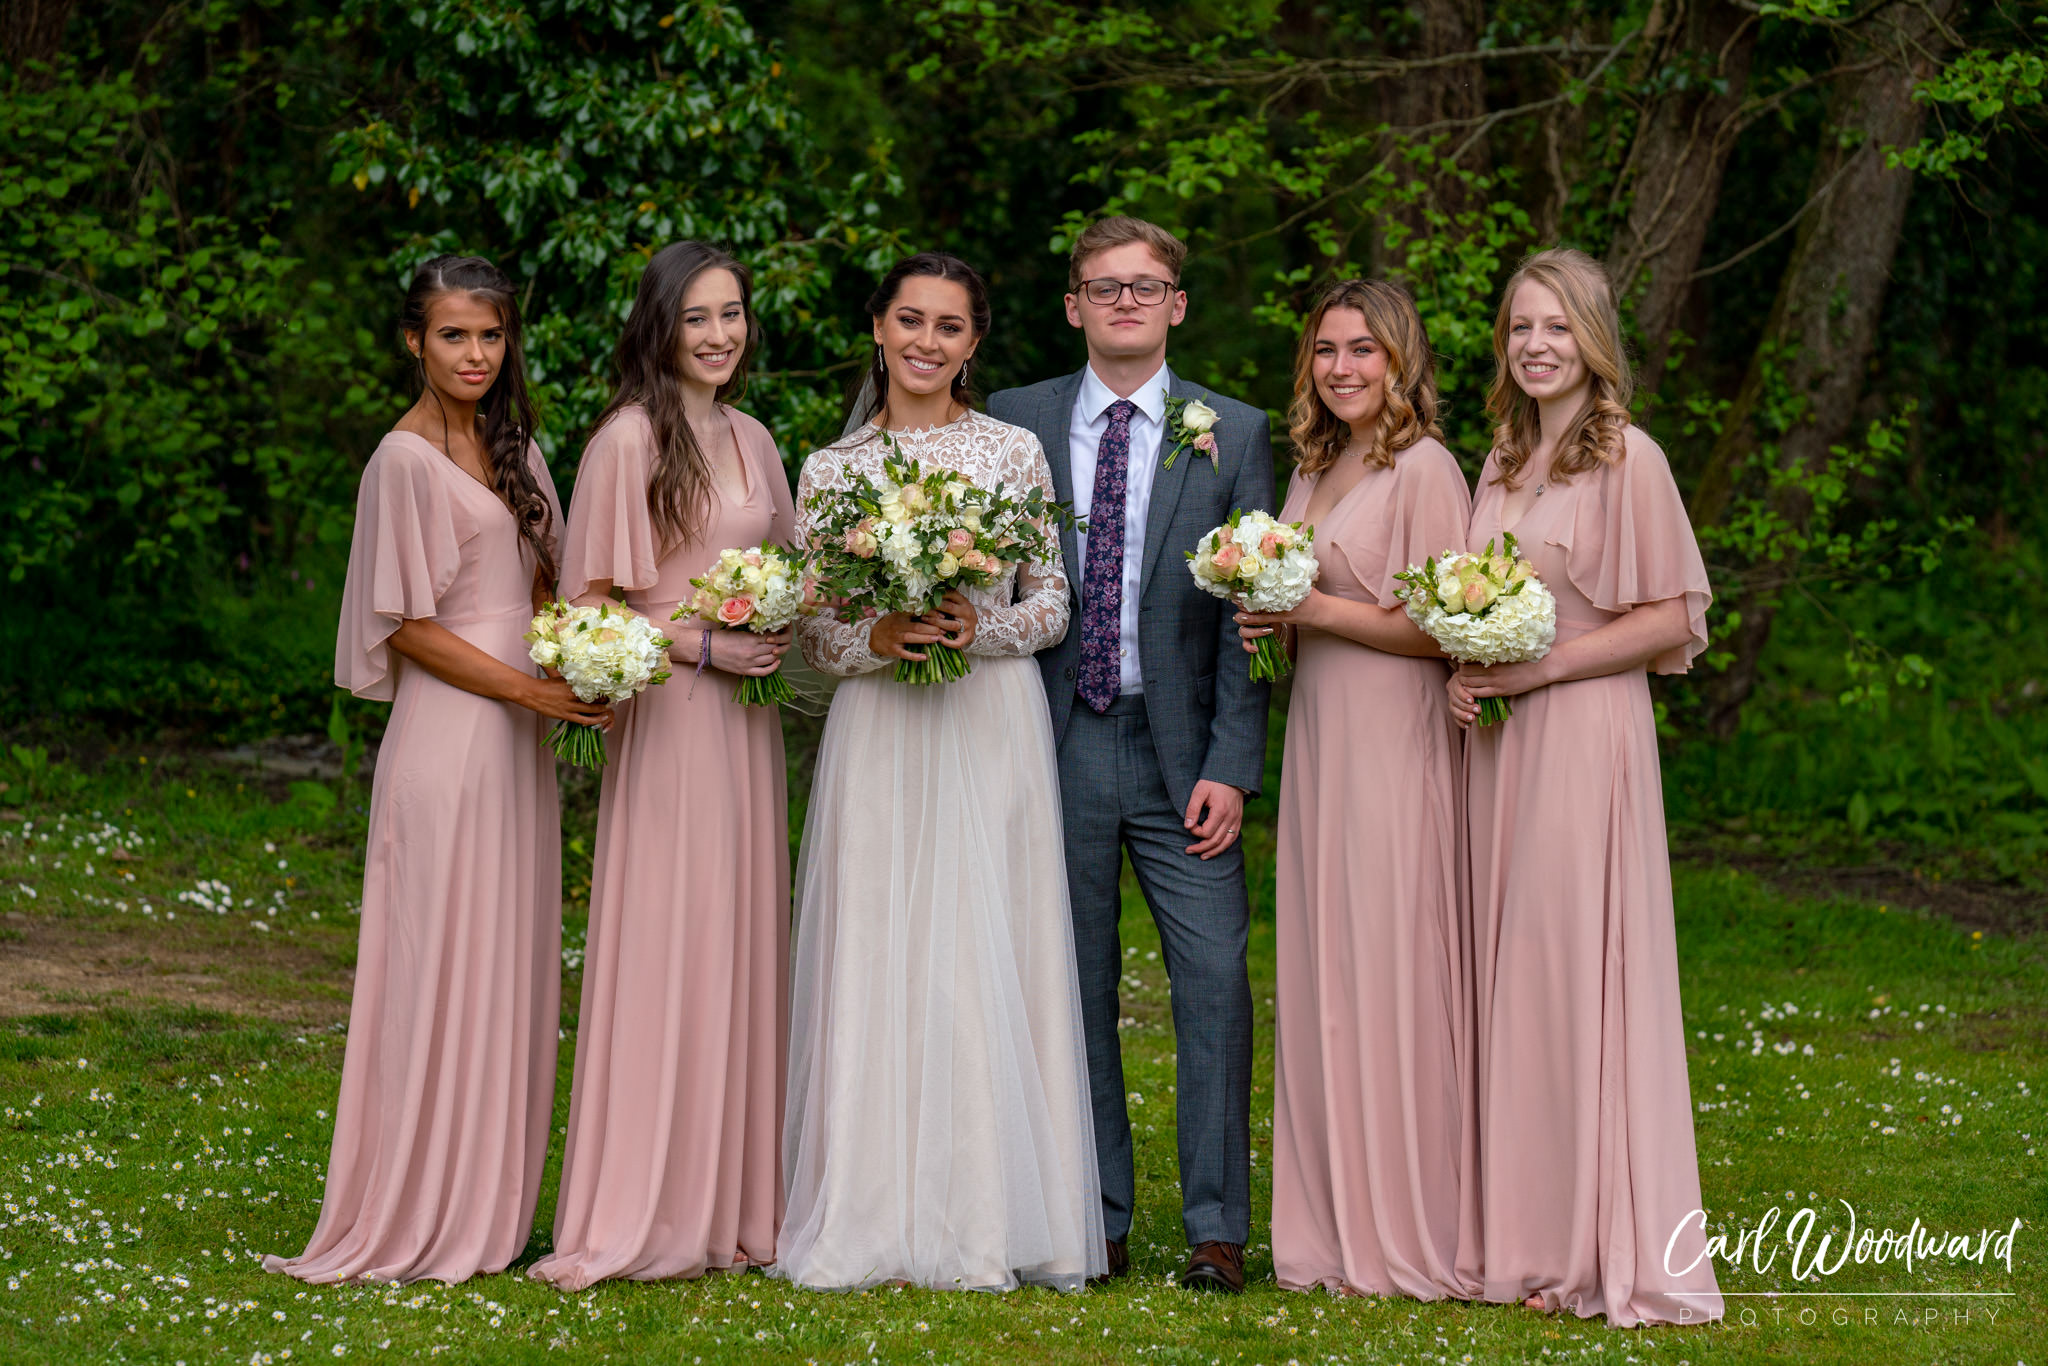 014-pencoed-house-estate-wedding-wedding-photography-cardiff-wedding-photographer.jpg